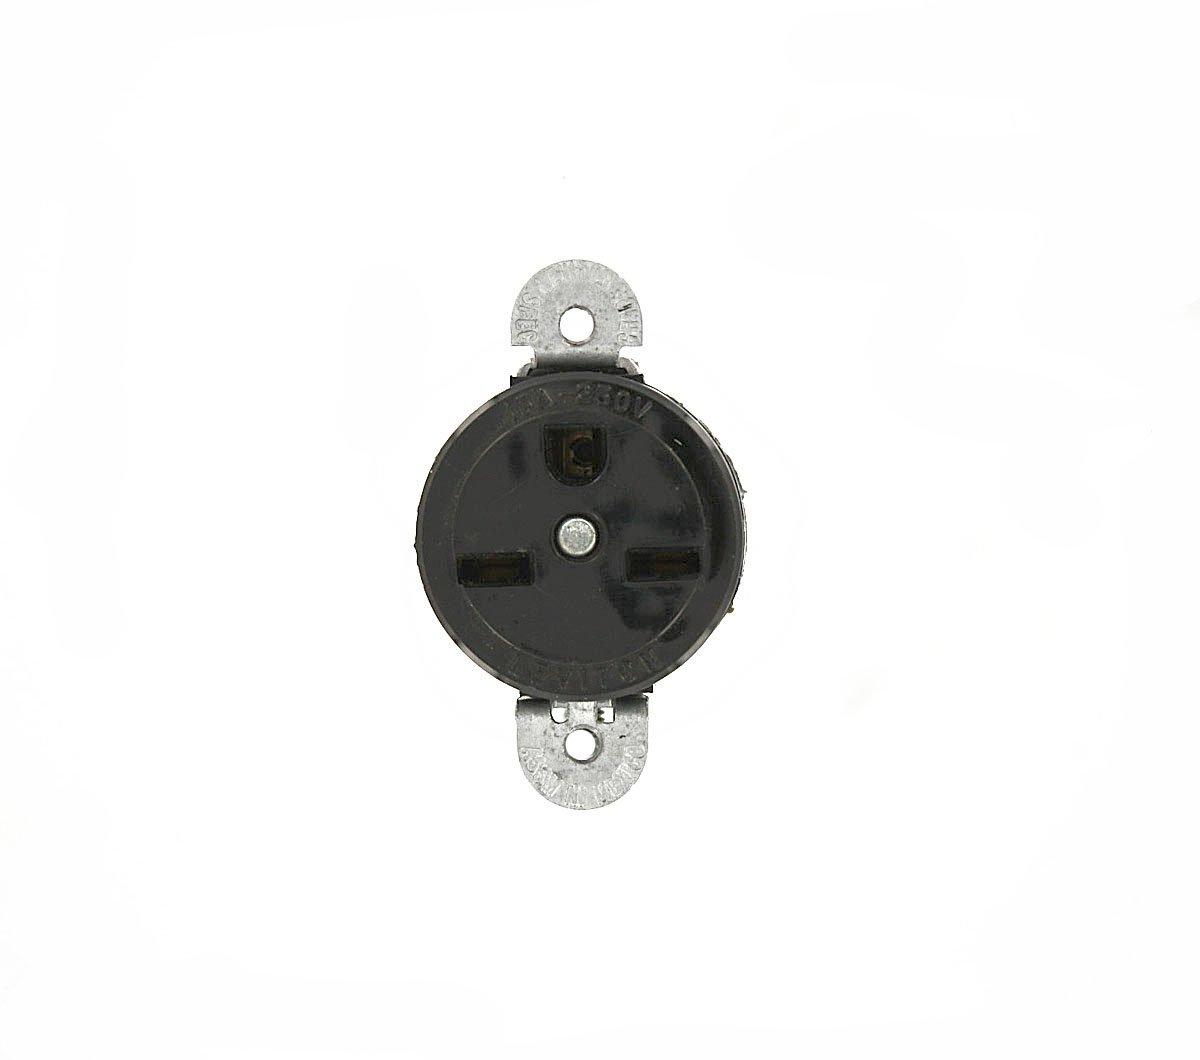 Leviton 5658-SS 15 Amp, 250 Volt, Short Strap Single Receptacle, Straight Blade, Commercial Grade, Grounding, Black